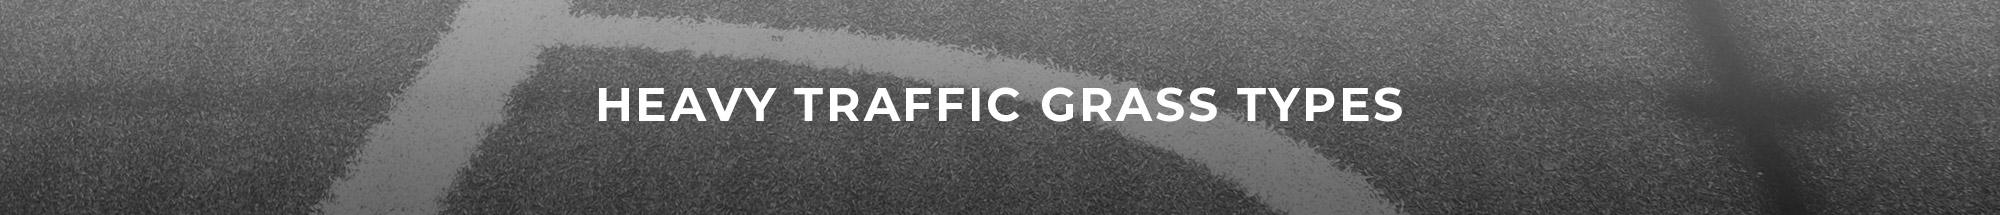 Header Image of Heavy Traffic Grass Types